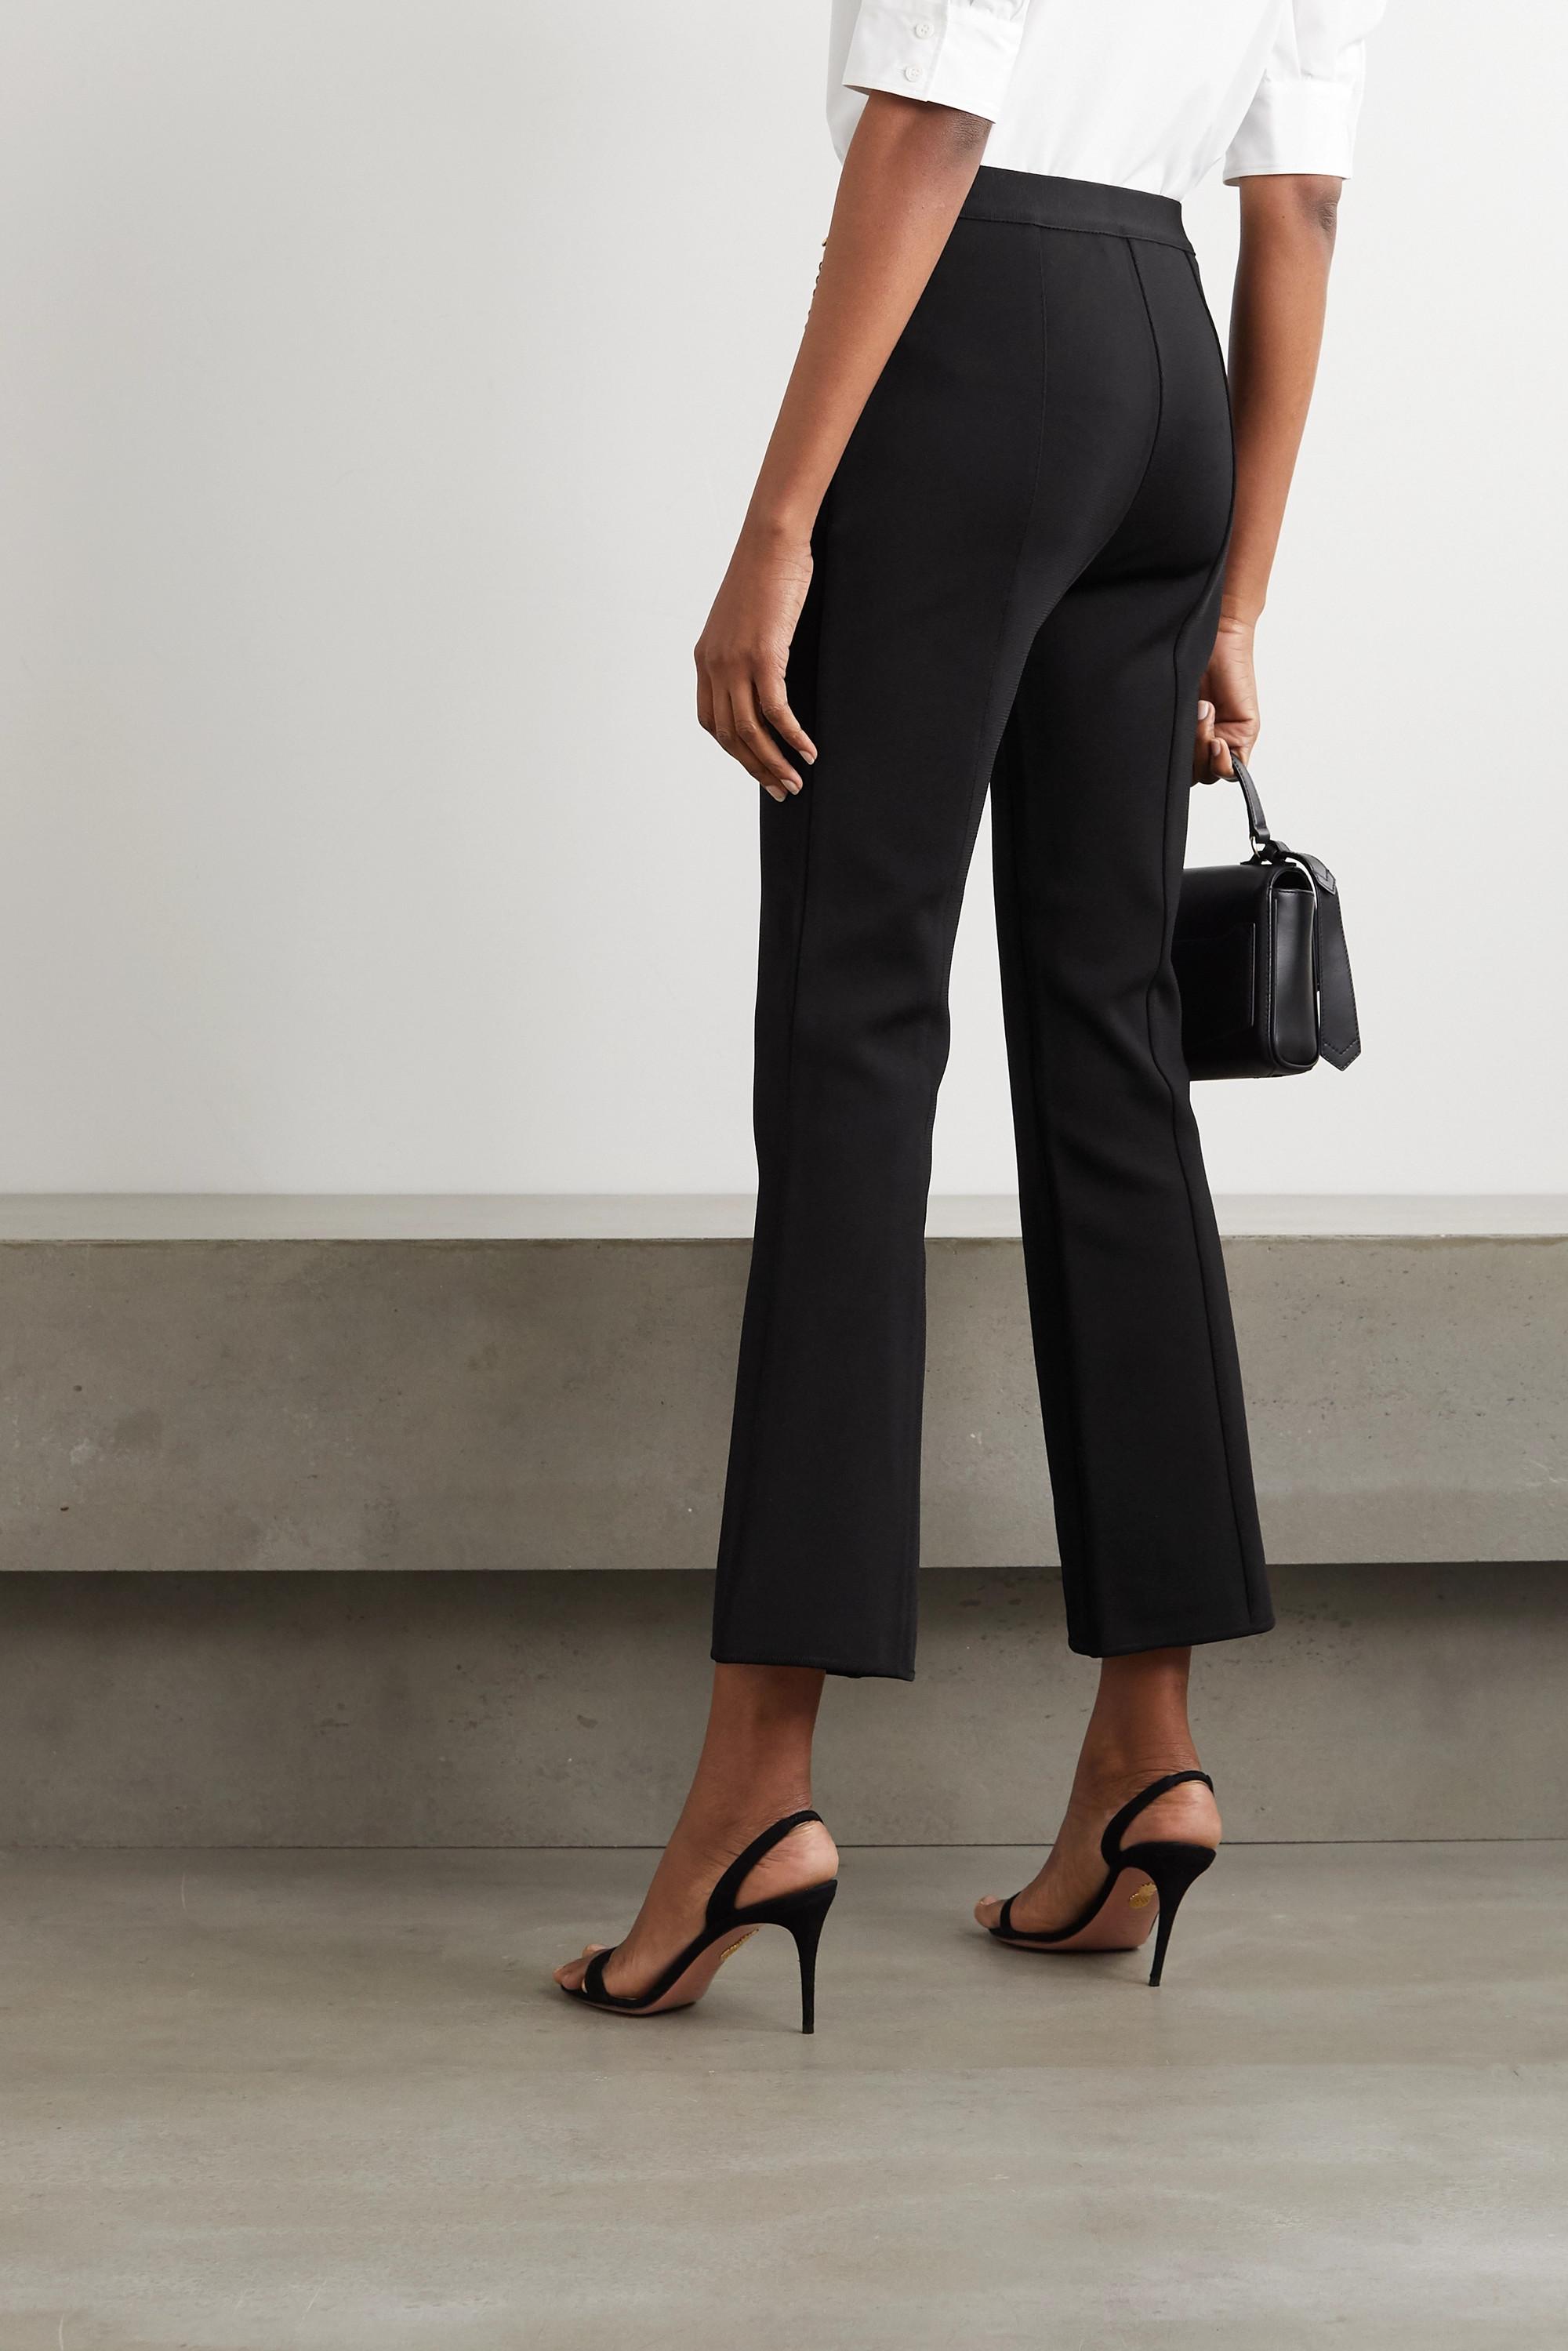 Givenchy Schlaghose aus Webstoff mit Kette